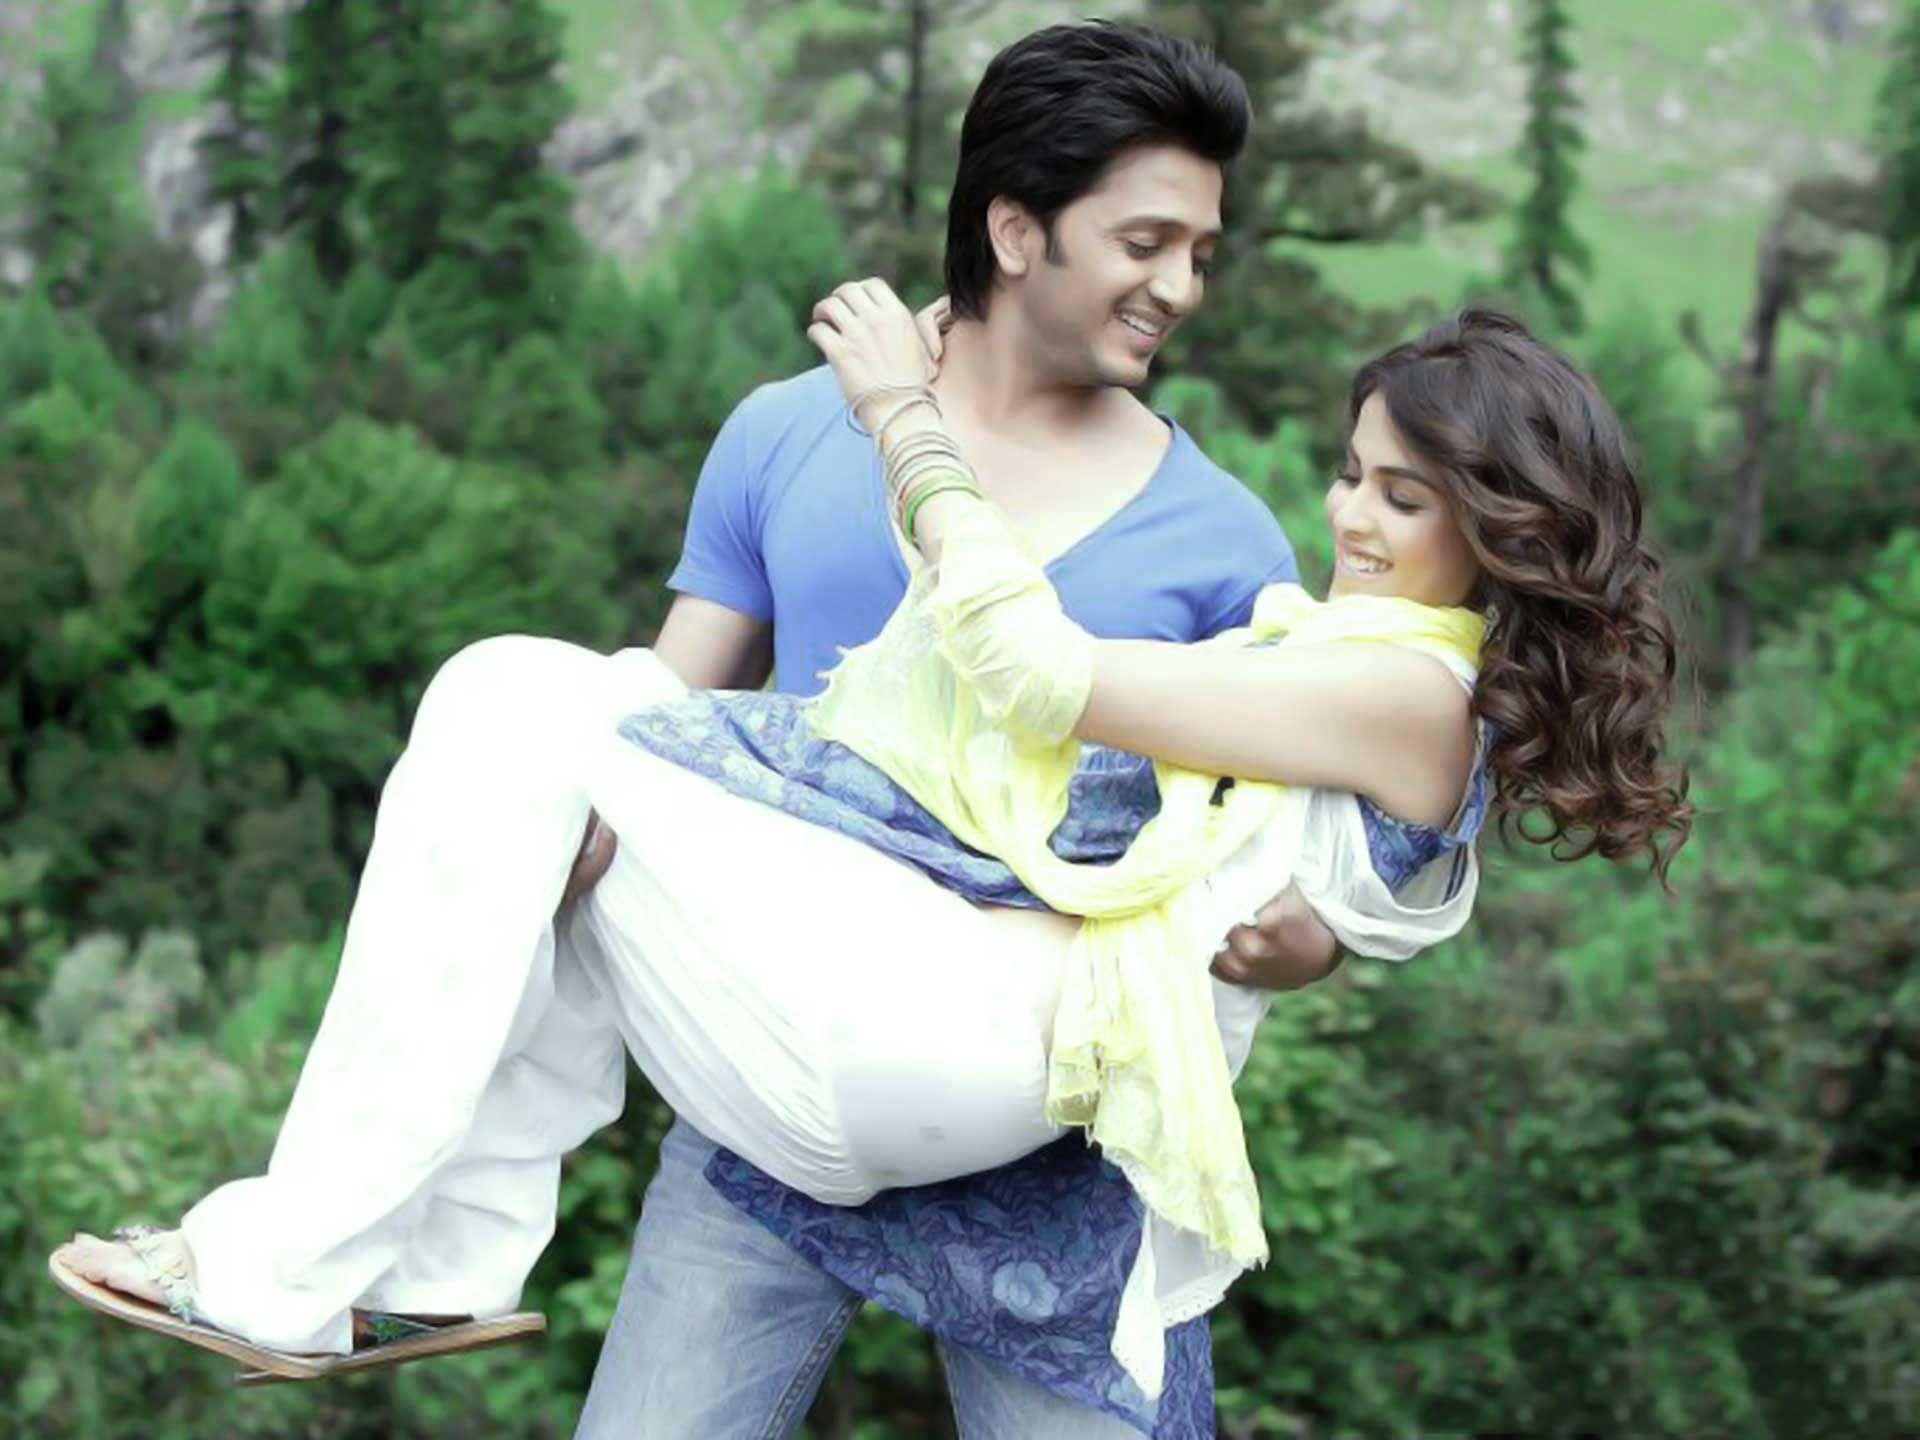 Romantic Love Couple Image Hd 1920x1440 Download Hd Wallpaper Wallpapertip